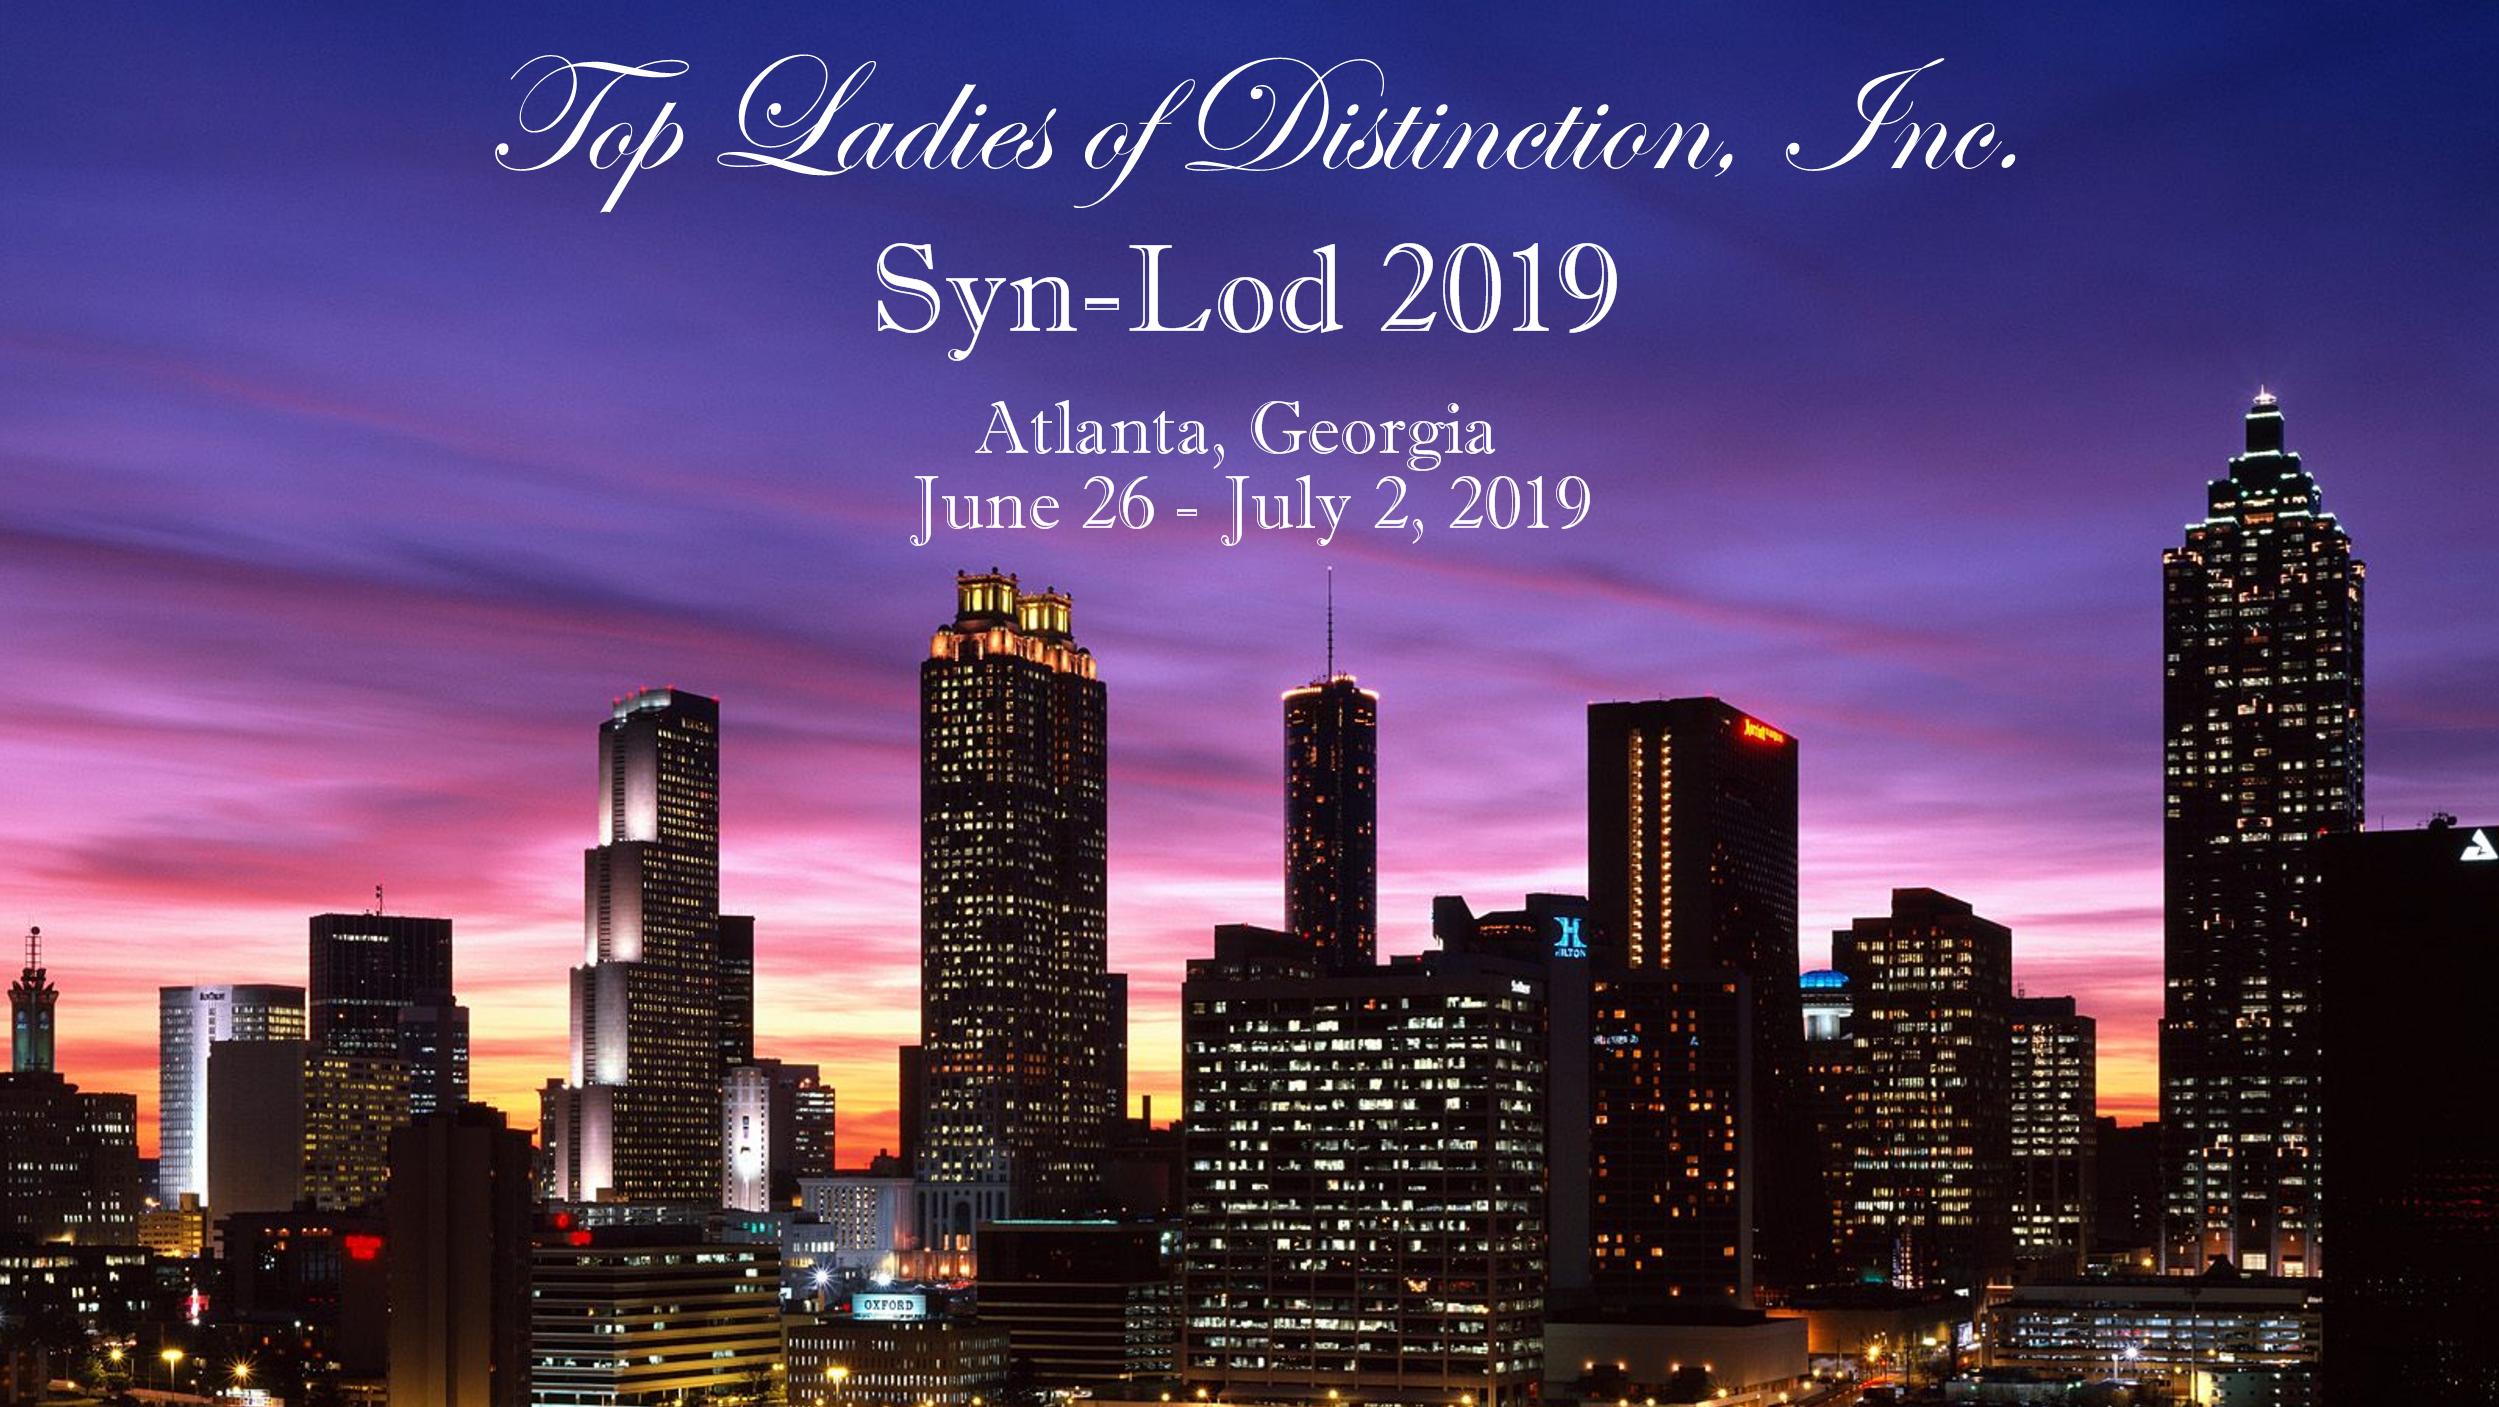 Syn Lod 2019 Top Ladies Of Distinction Inc